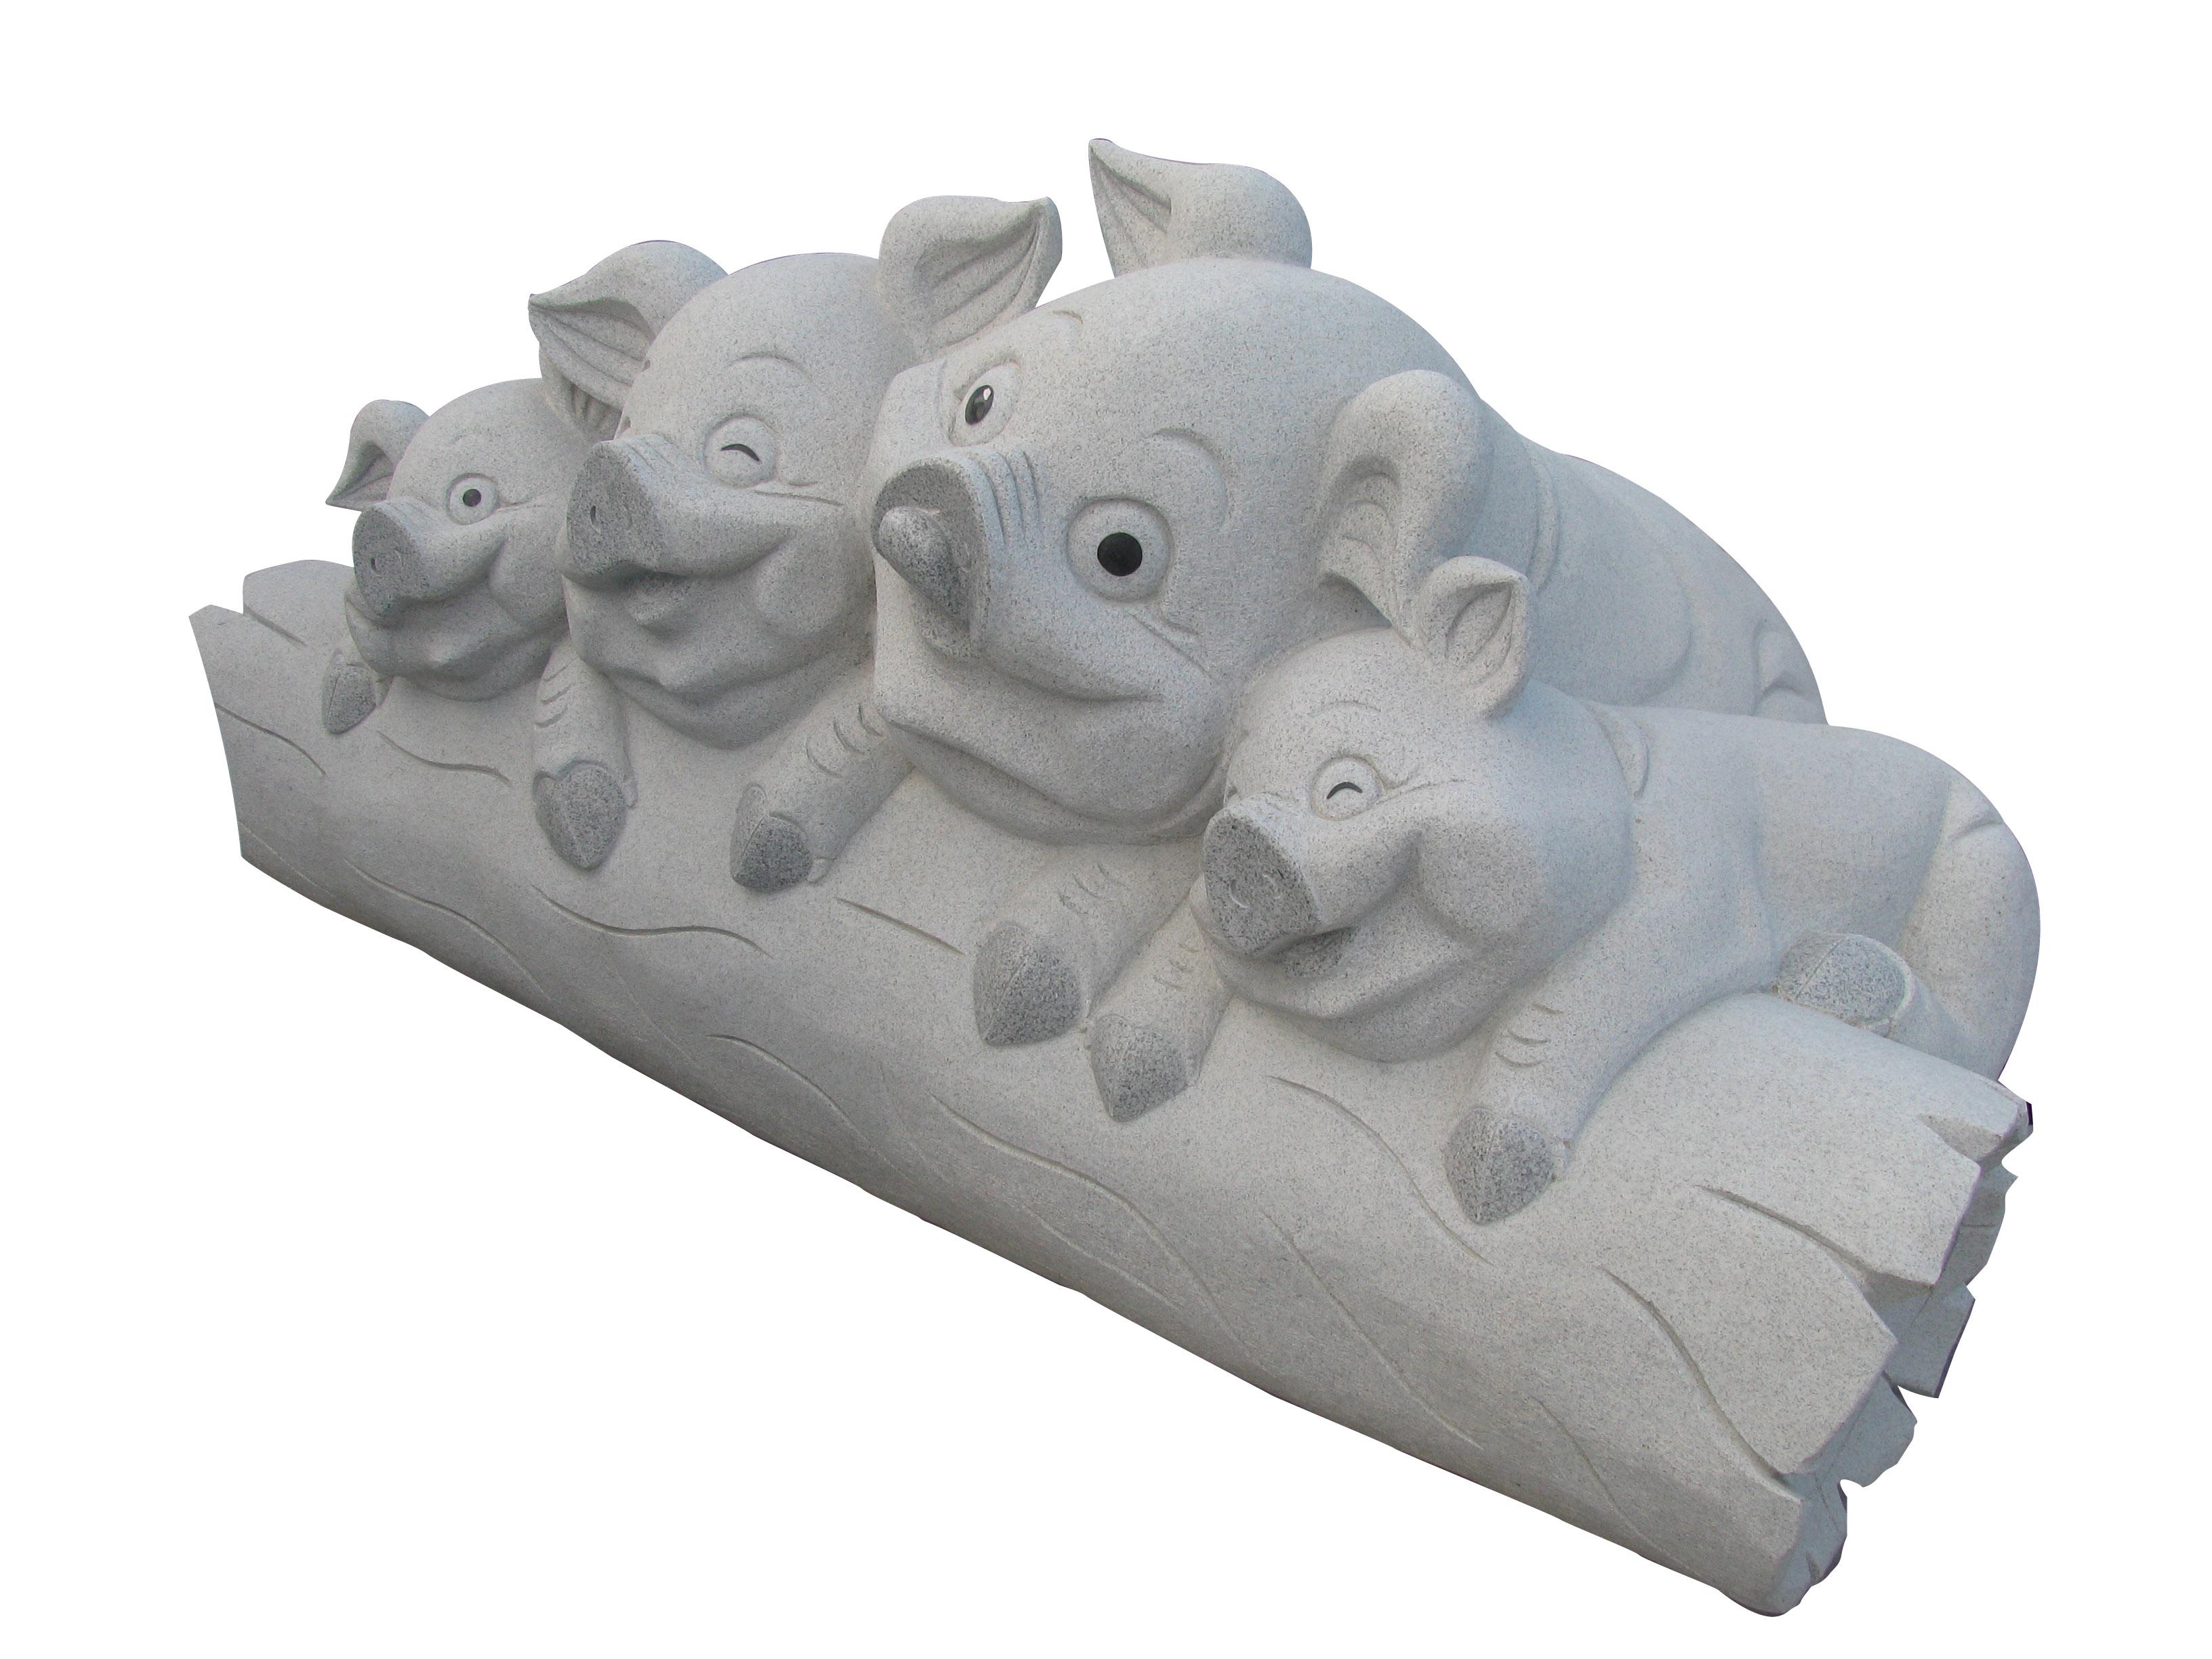 Happy Pigs Sculpture